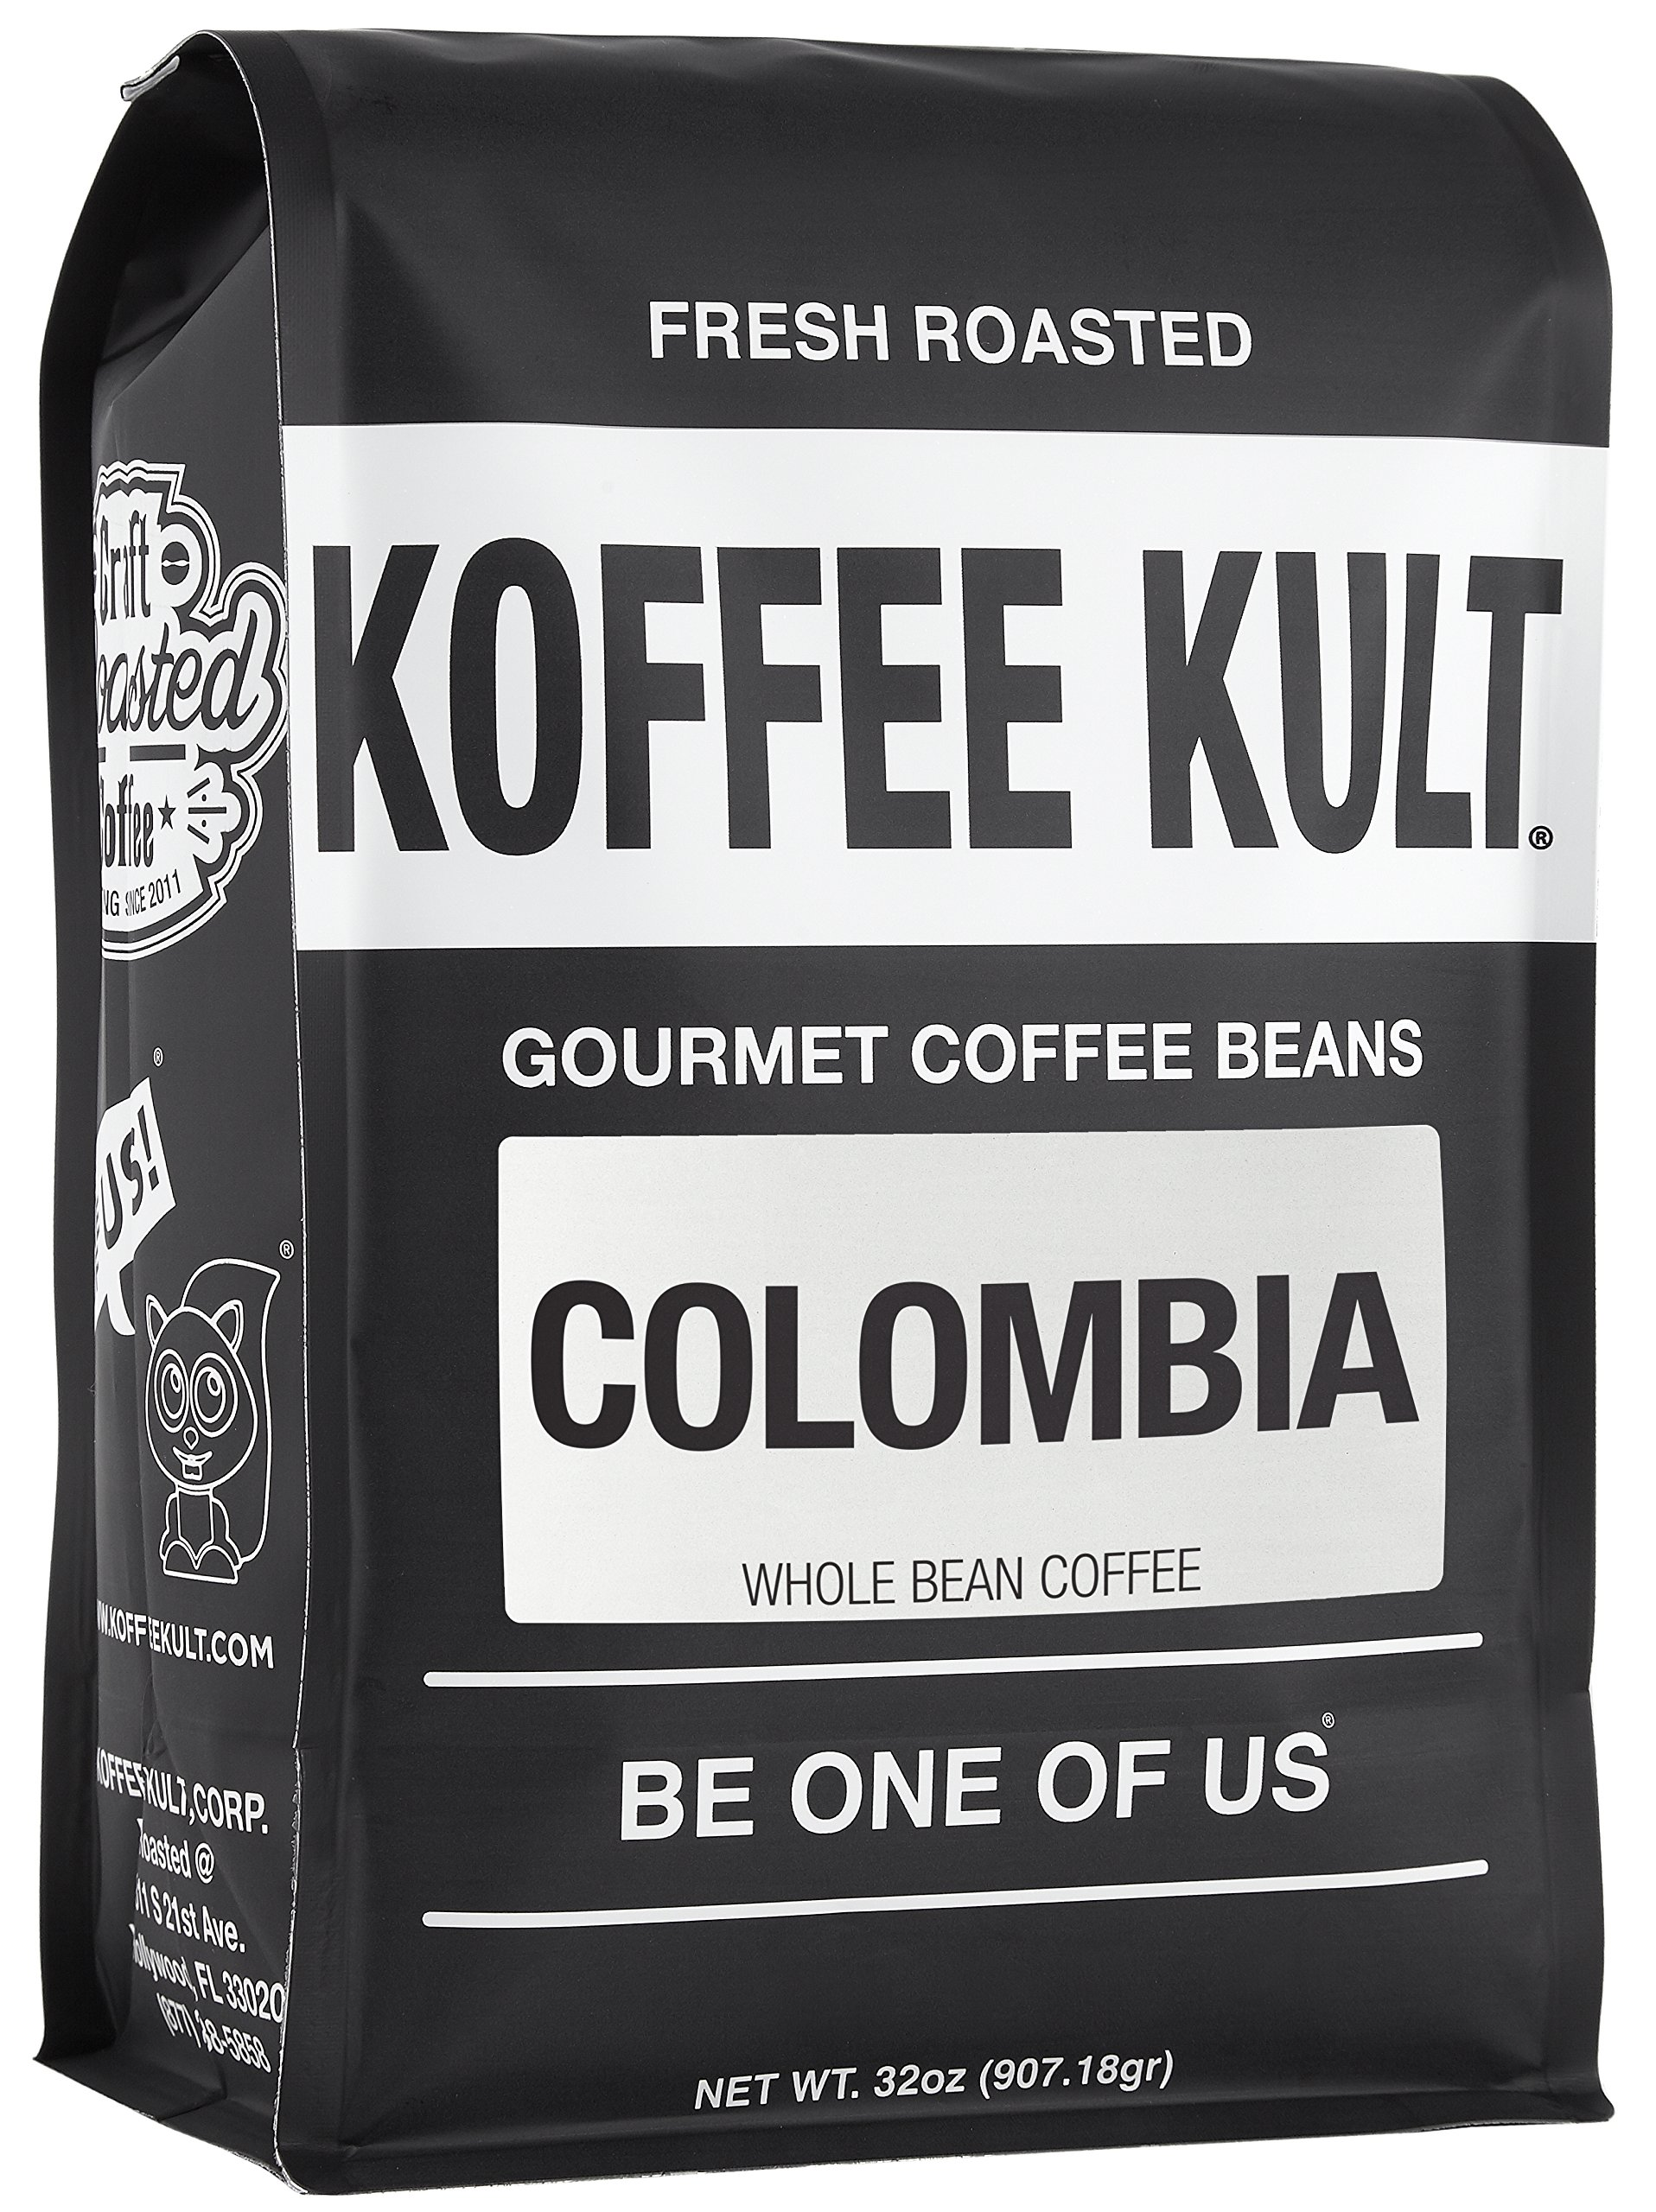 Koffee Kult Colombian Huila Fresh Coffee Beans - Whole Bean Coffee - Fresh Roasted 32oz by Koffee Kult